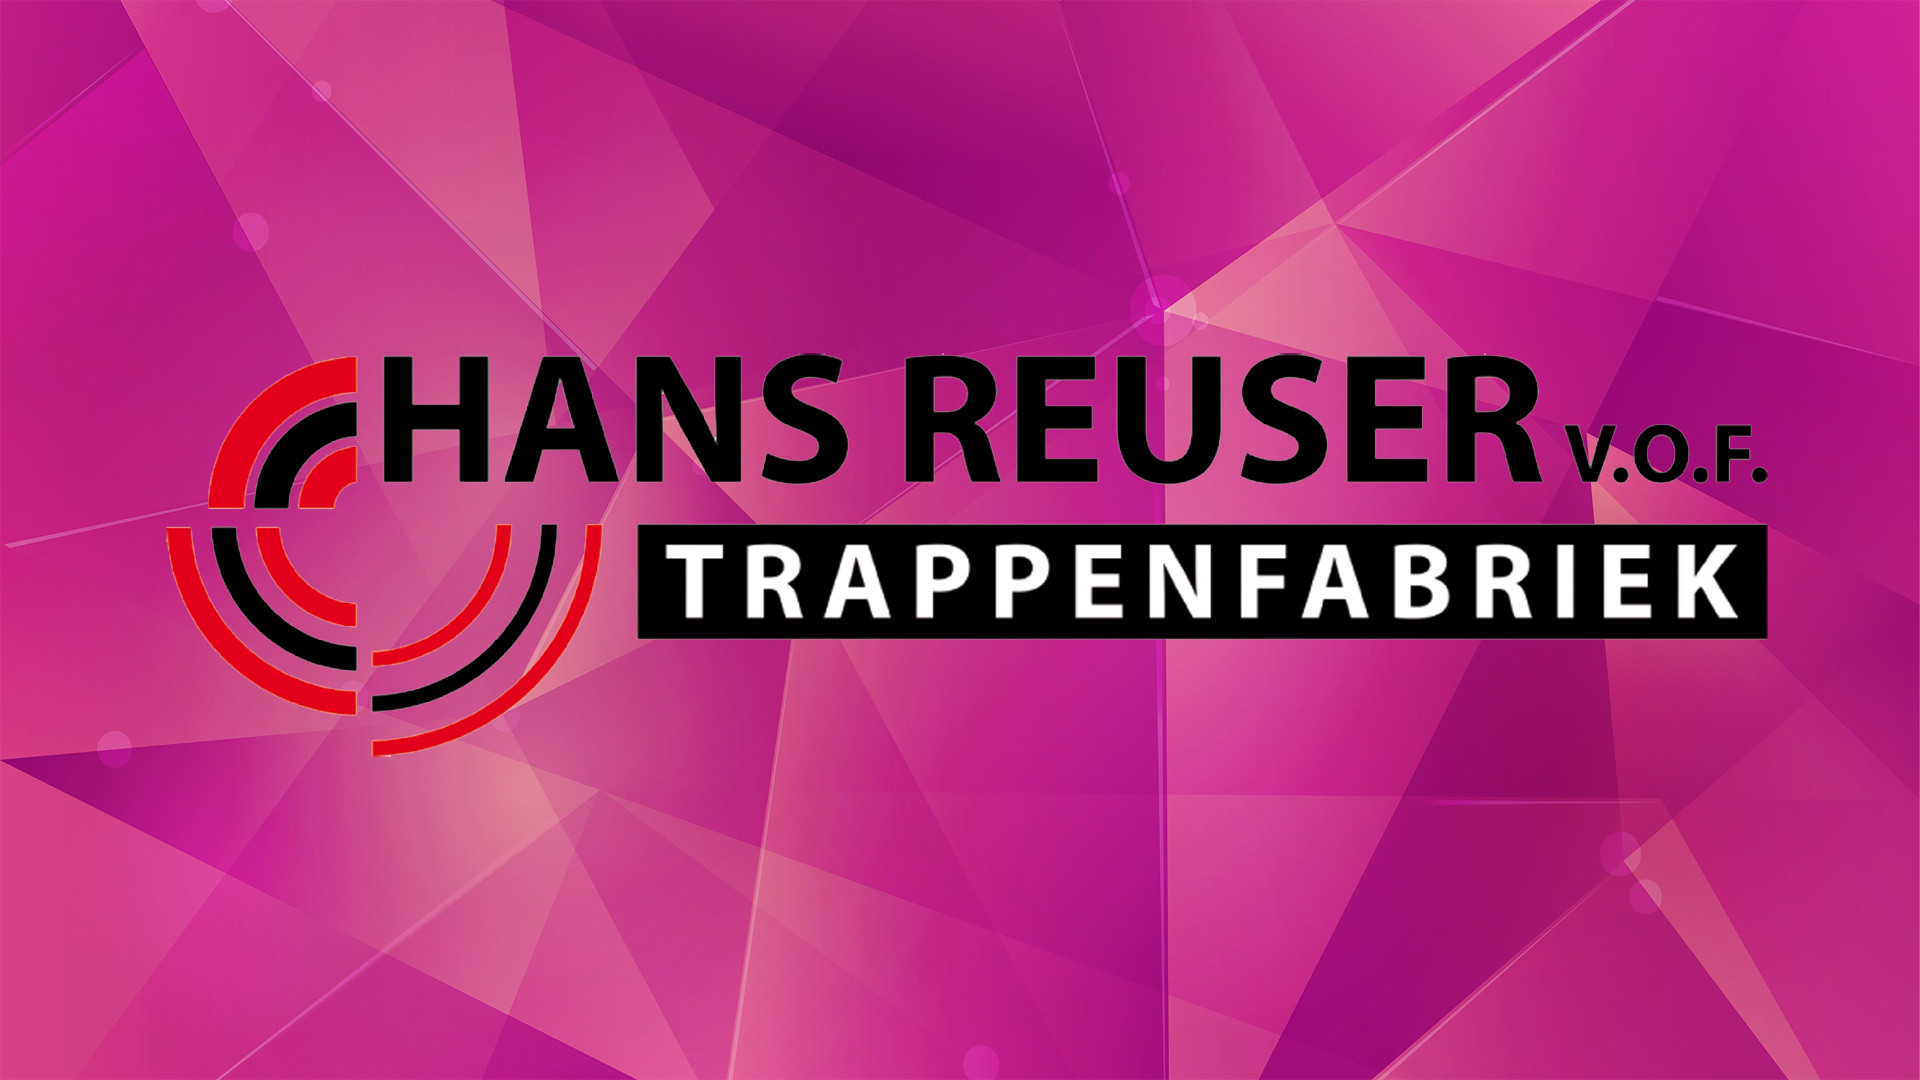 Hans Reuser Trappenfabriek